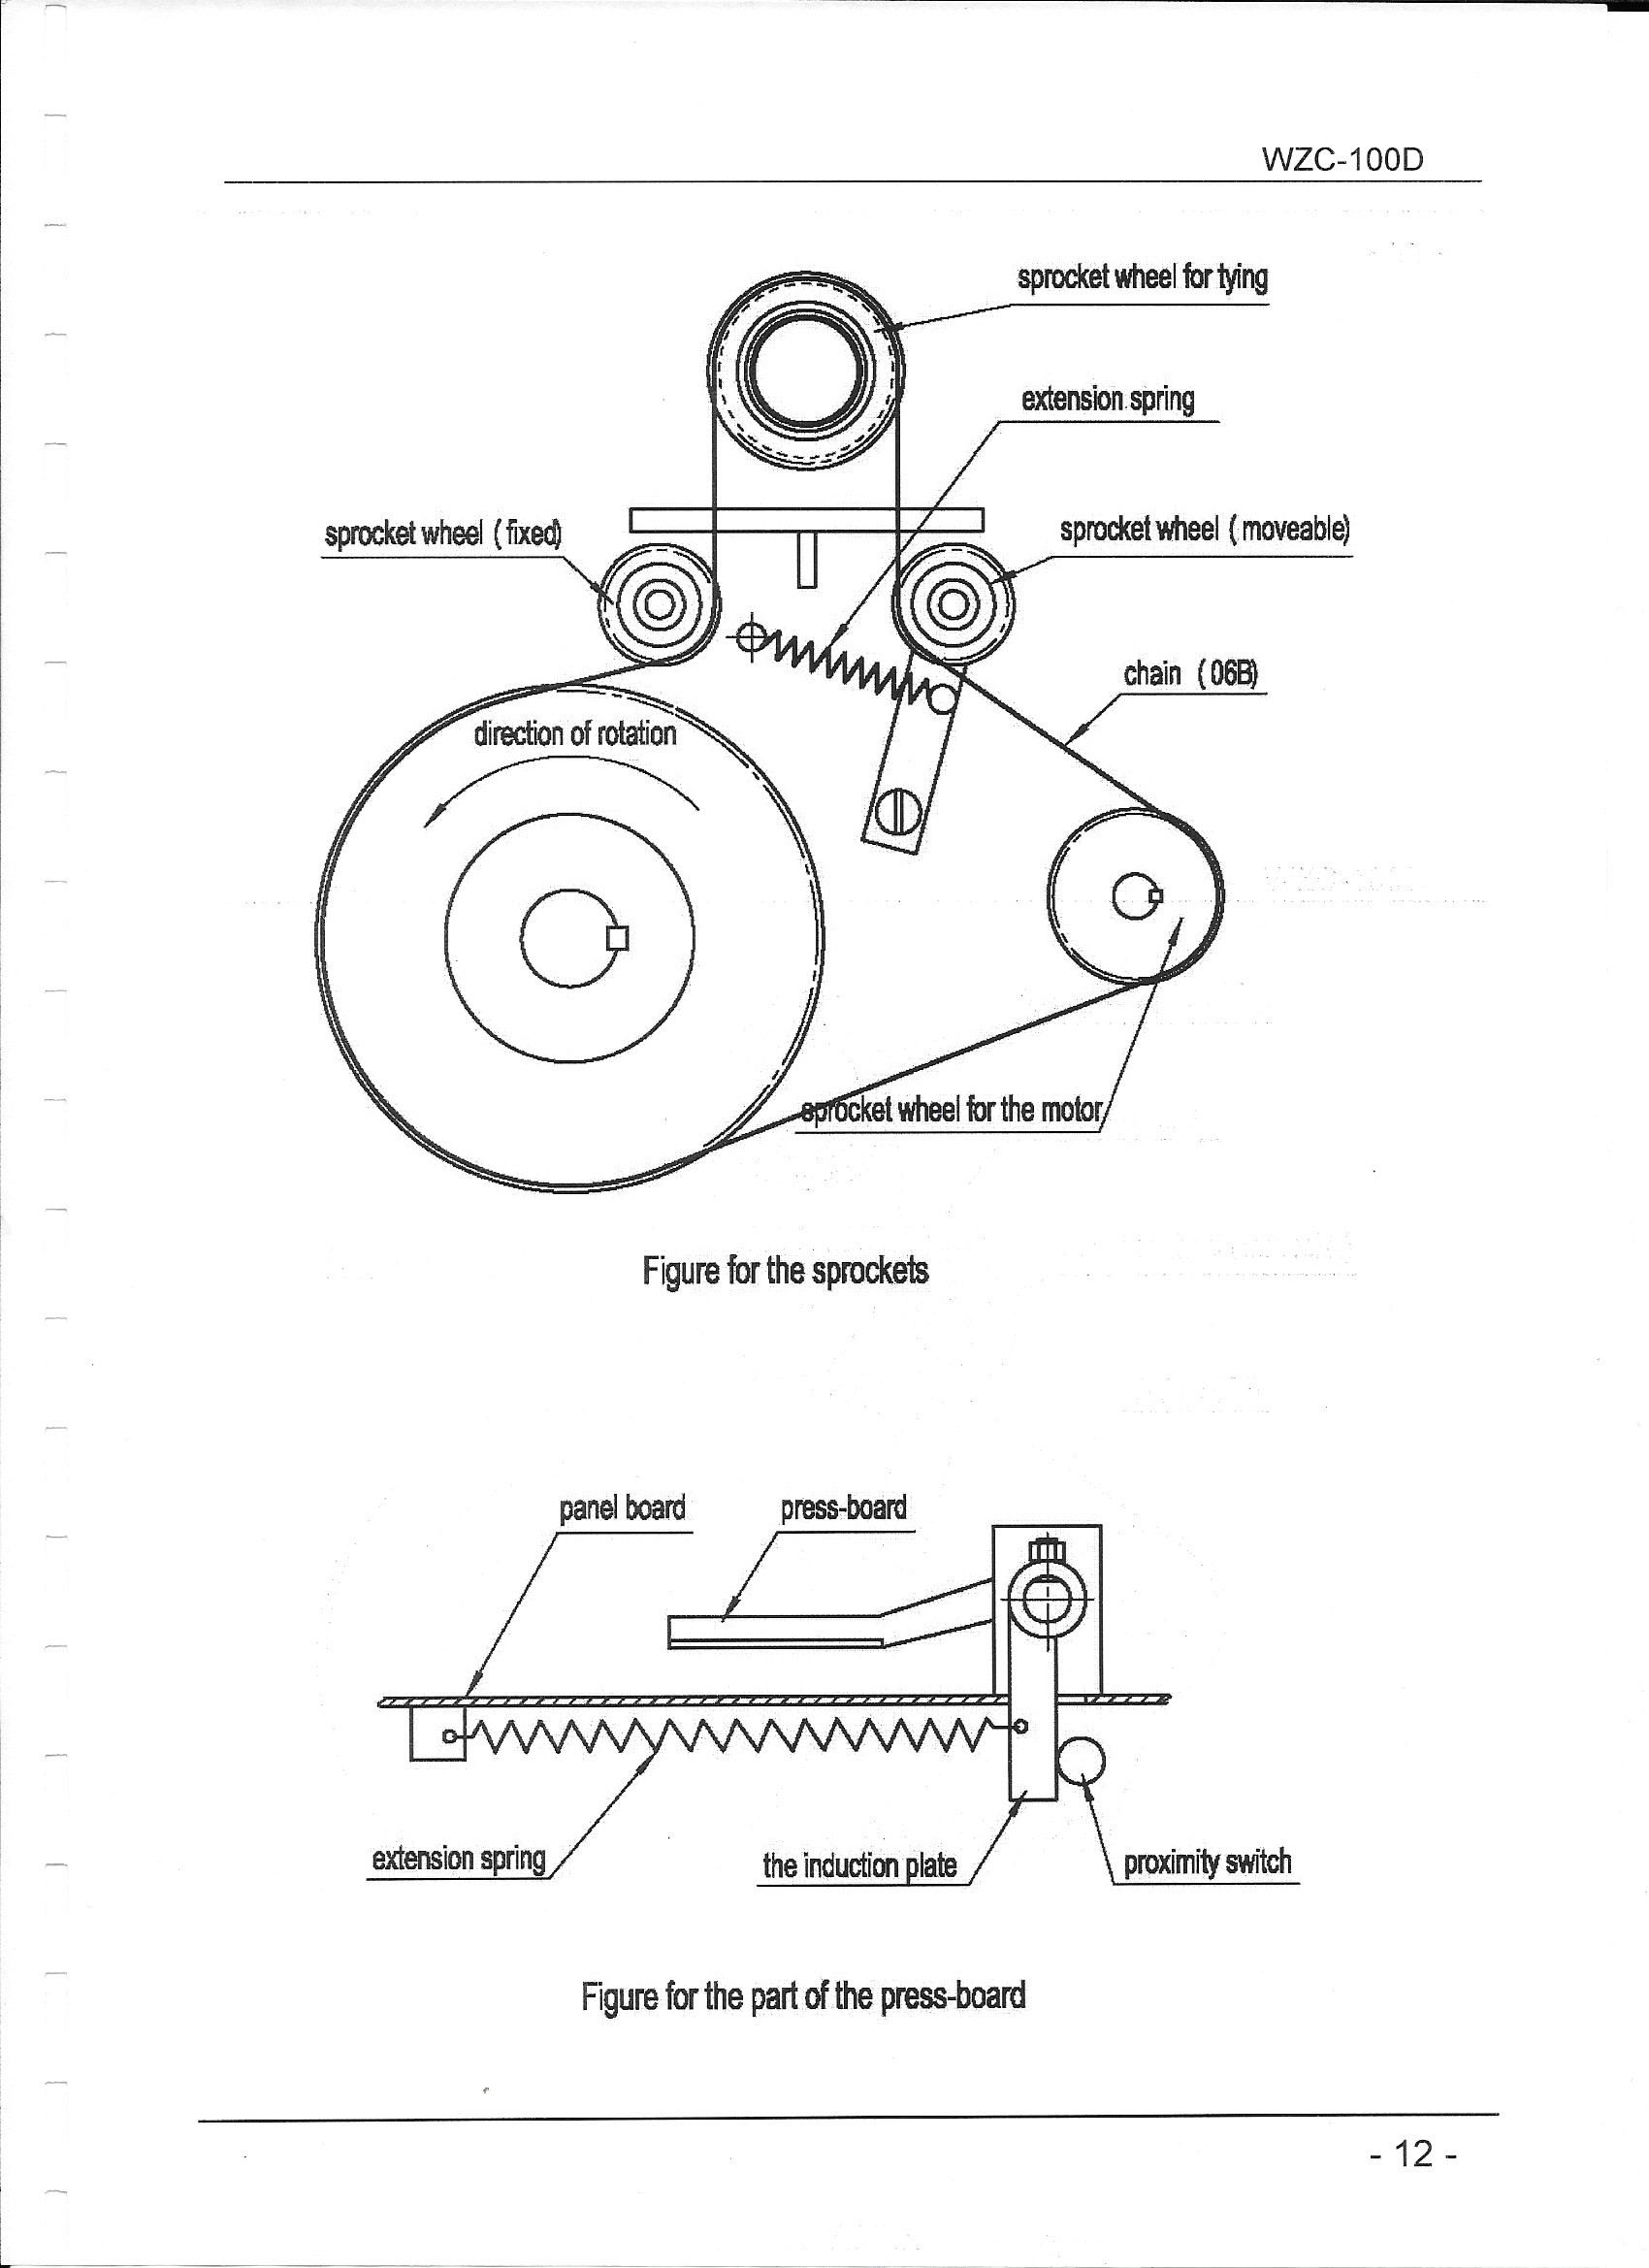 Electric Tying Machine Manual